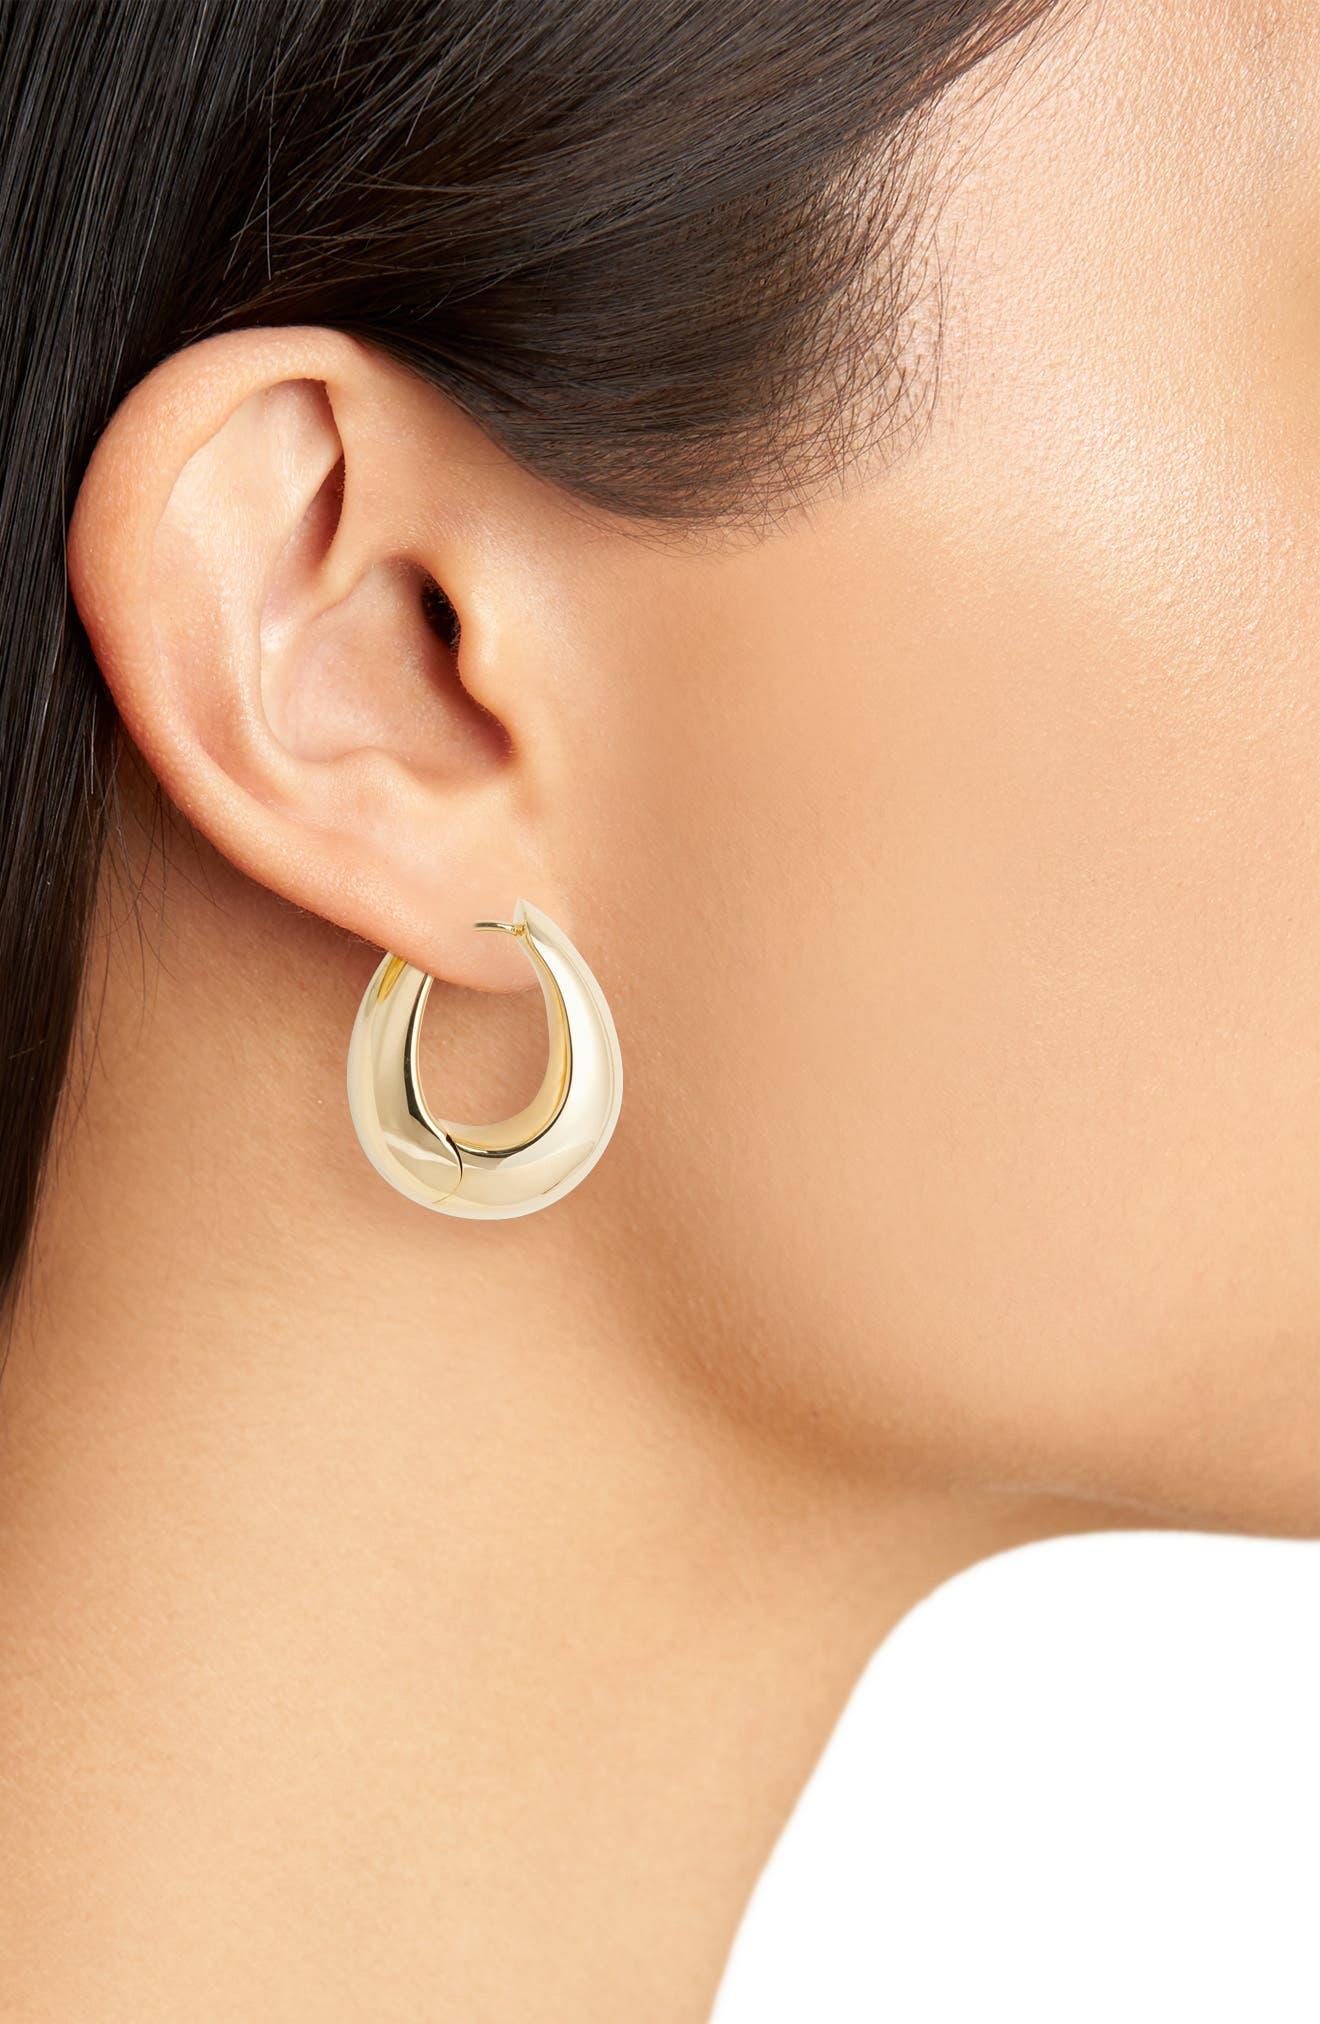 Large Ice Hoop Earrings,                             Alternate thumbnail 2, color,                             925 SILVER/9K GOLD